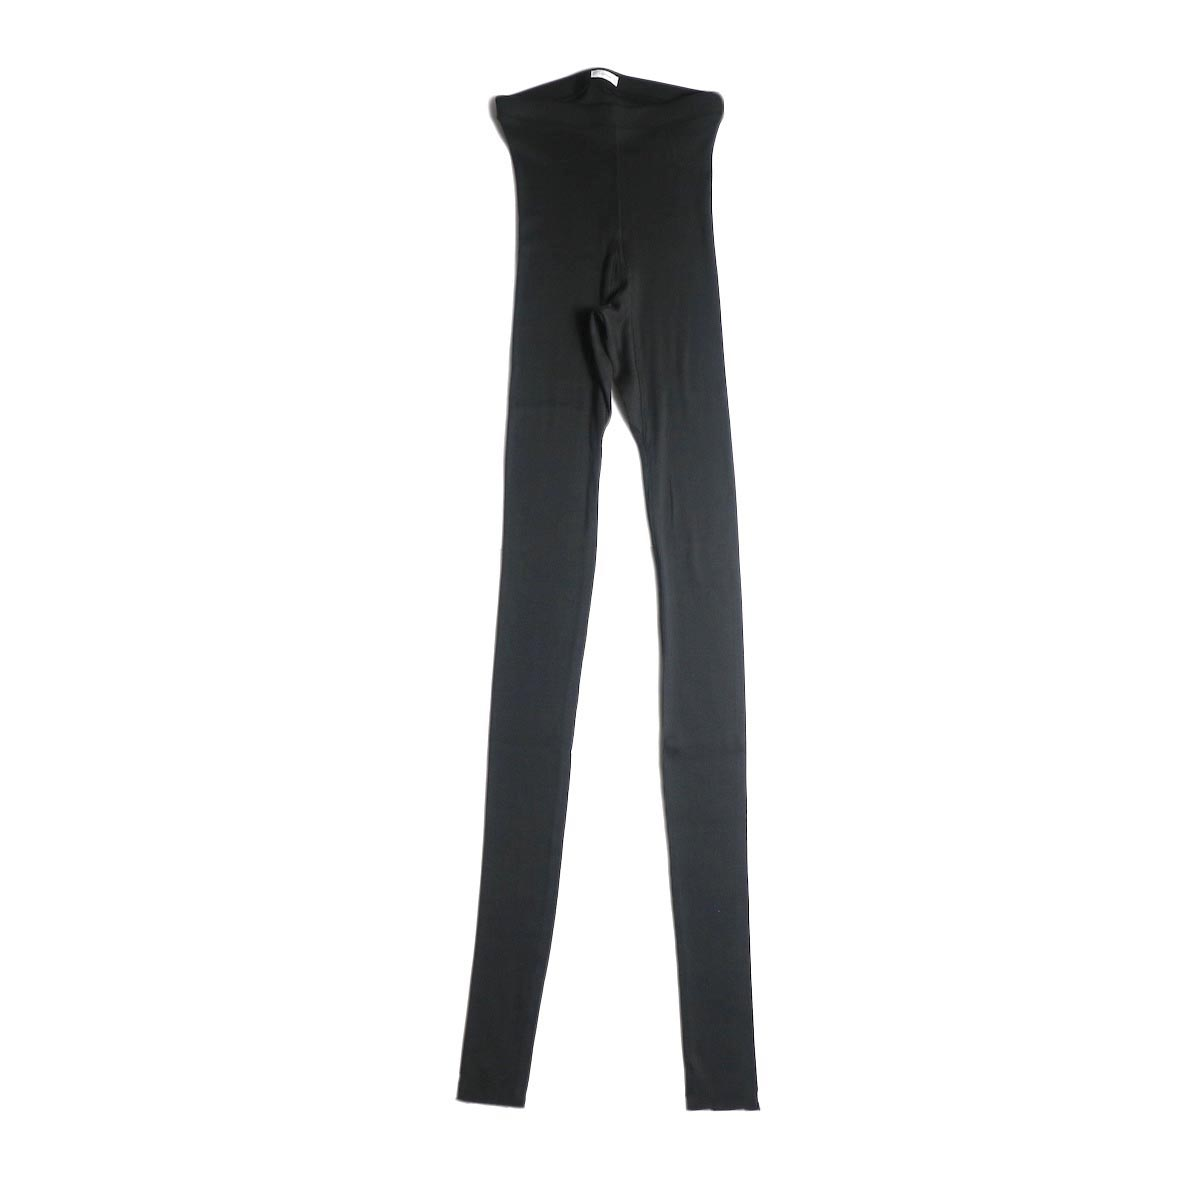 blurhms / Cotton High Stretch Rib Leggings black